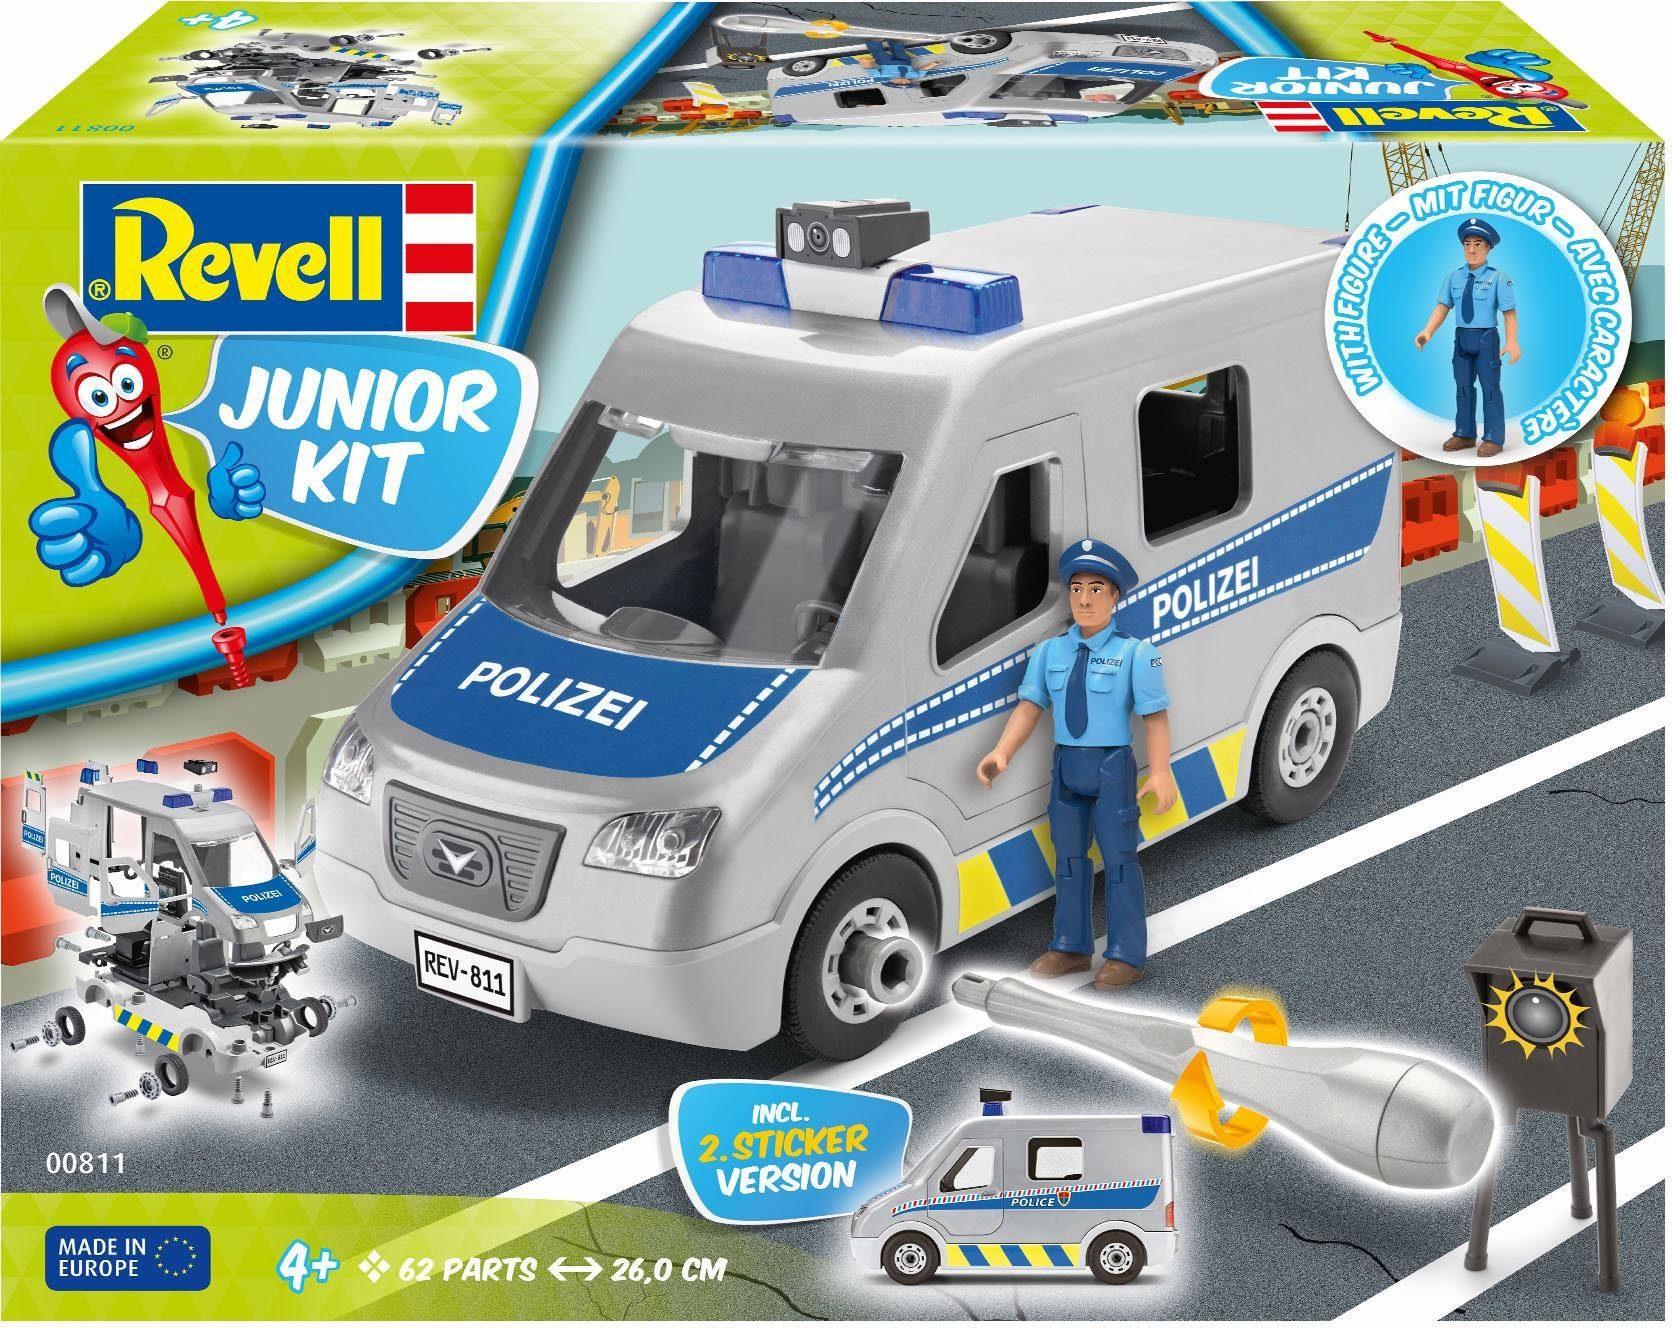 Revell Modellbausatz Auto, »Junior Kit Polizei Fahrzeug mit Figur«